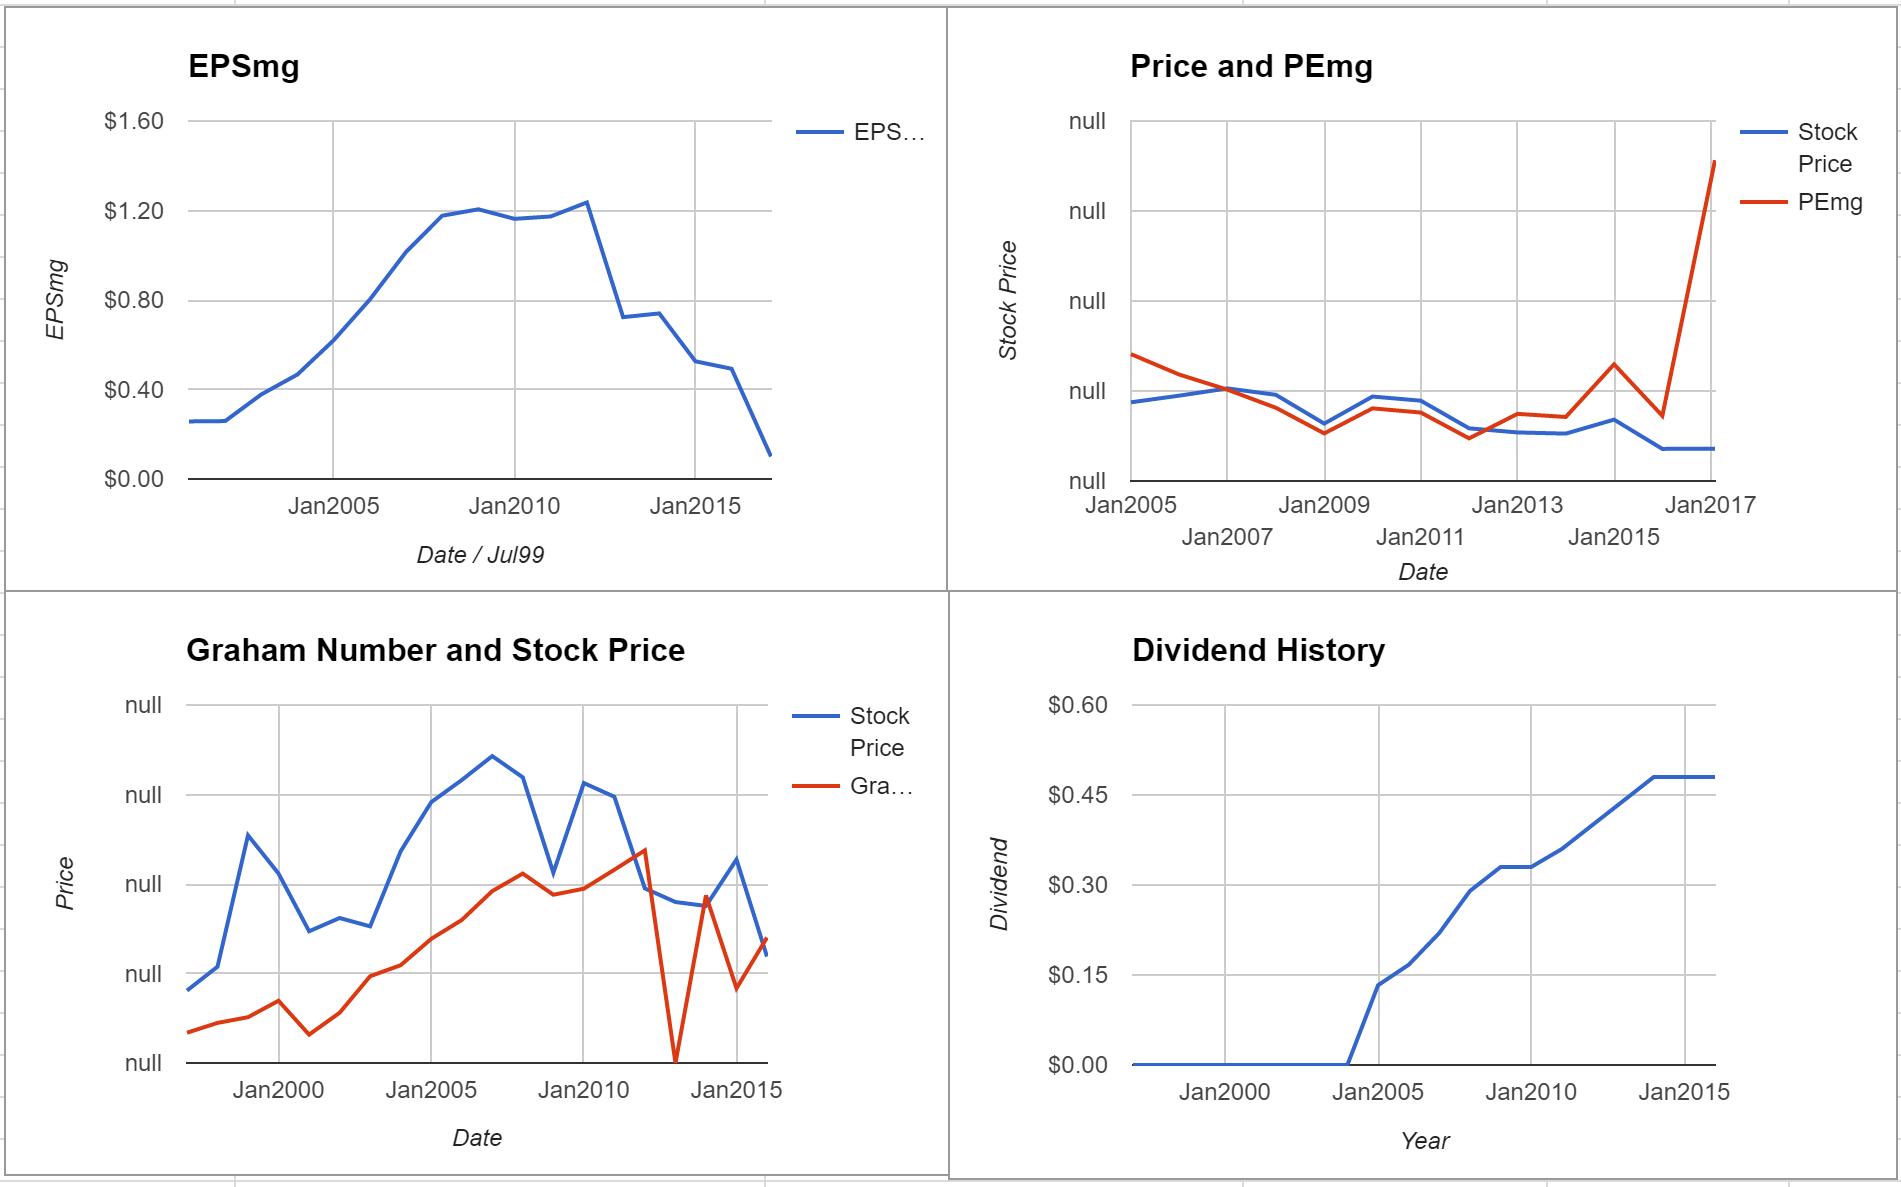 Staples Inc Valuation – February 2017 $SPLS